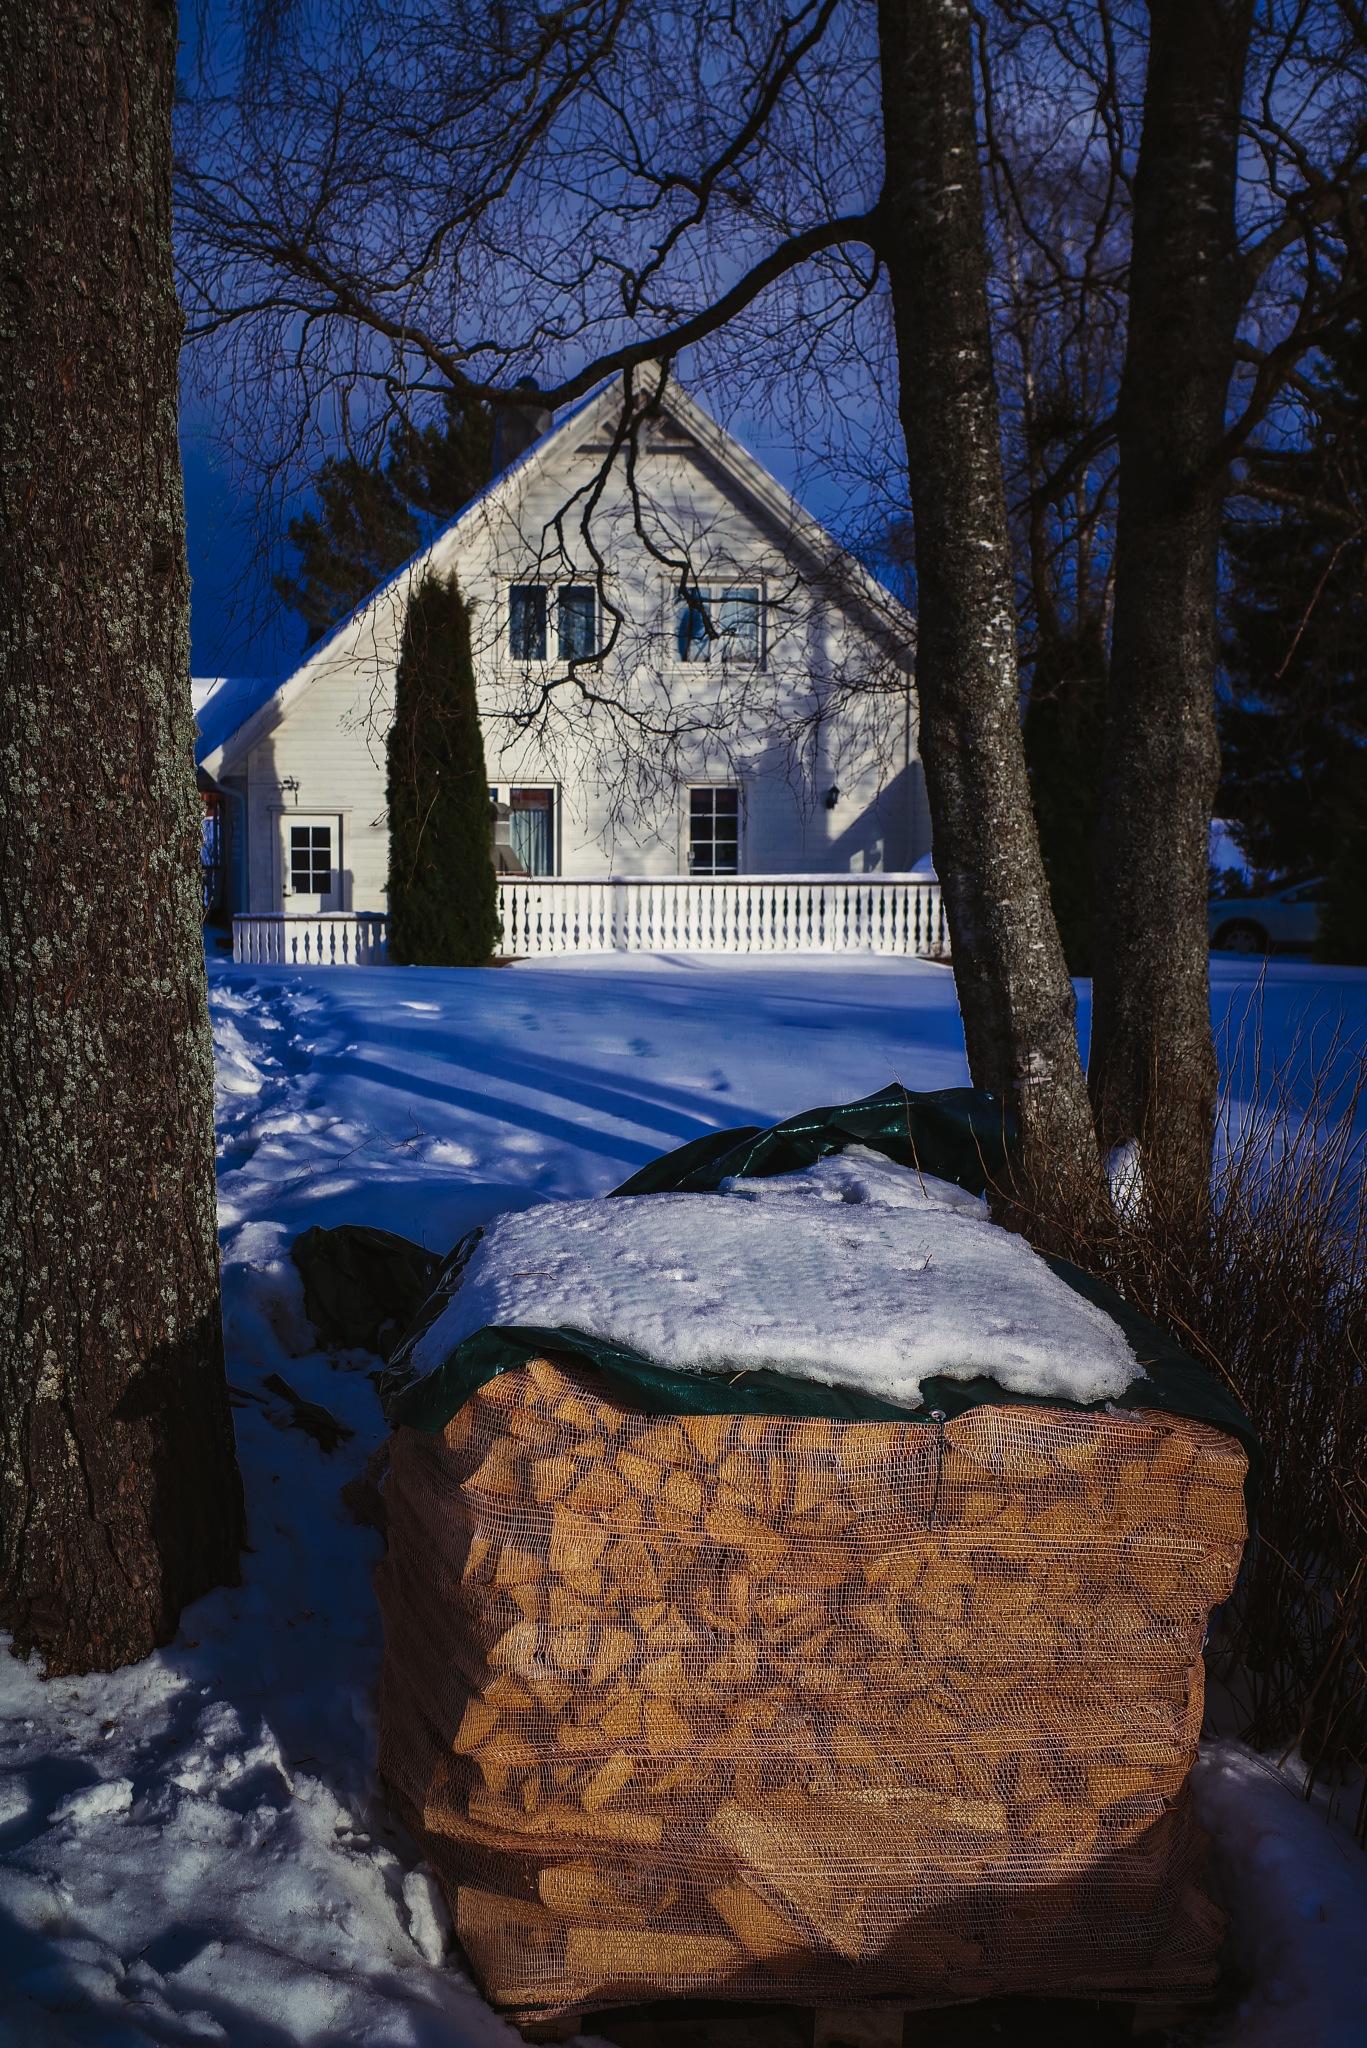 House in  Norwegian Winter Village by Goran Jorganovich